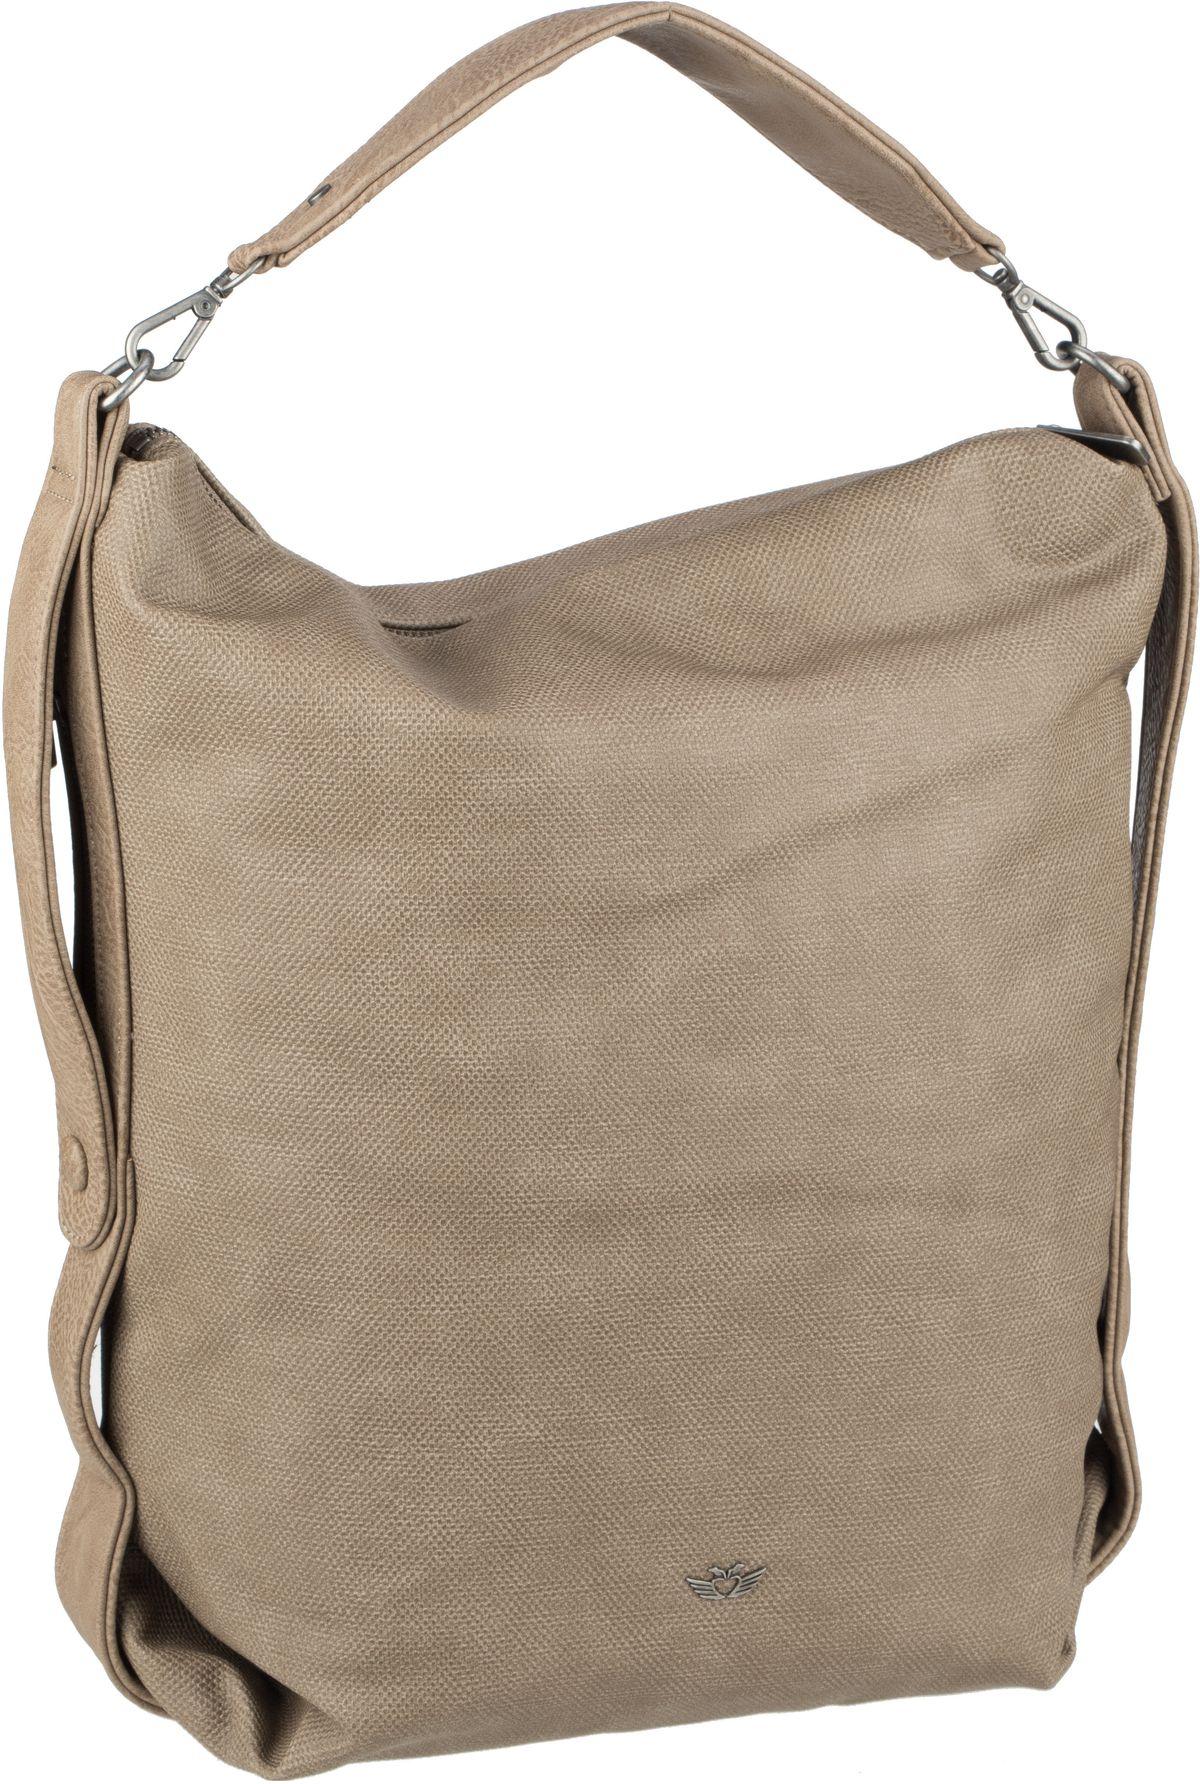 Handtasche Ava Pixley Mud